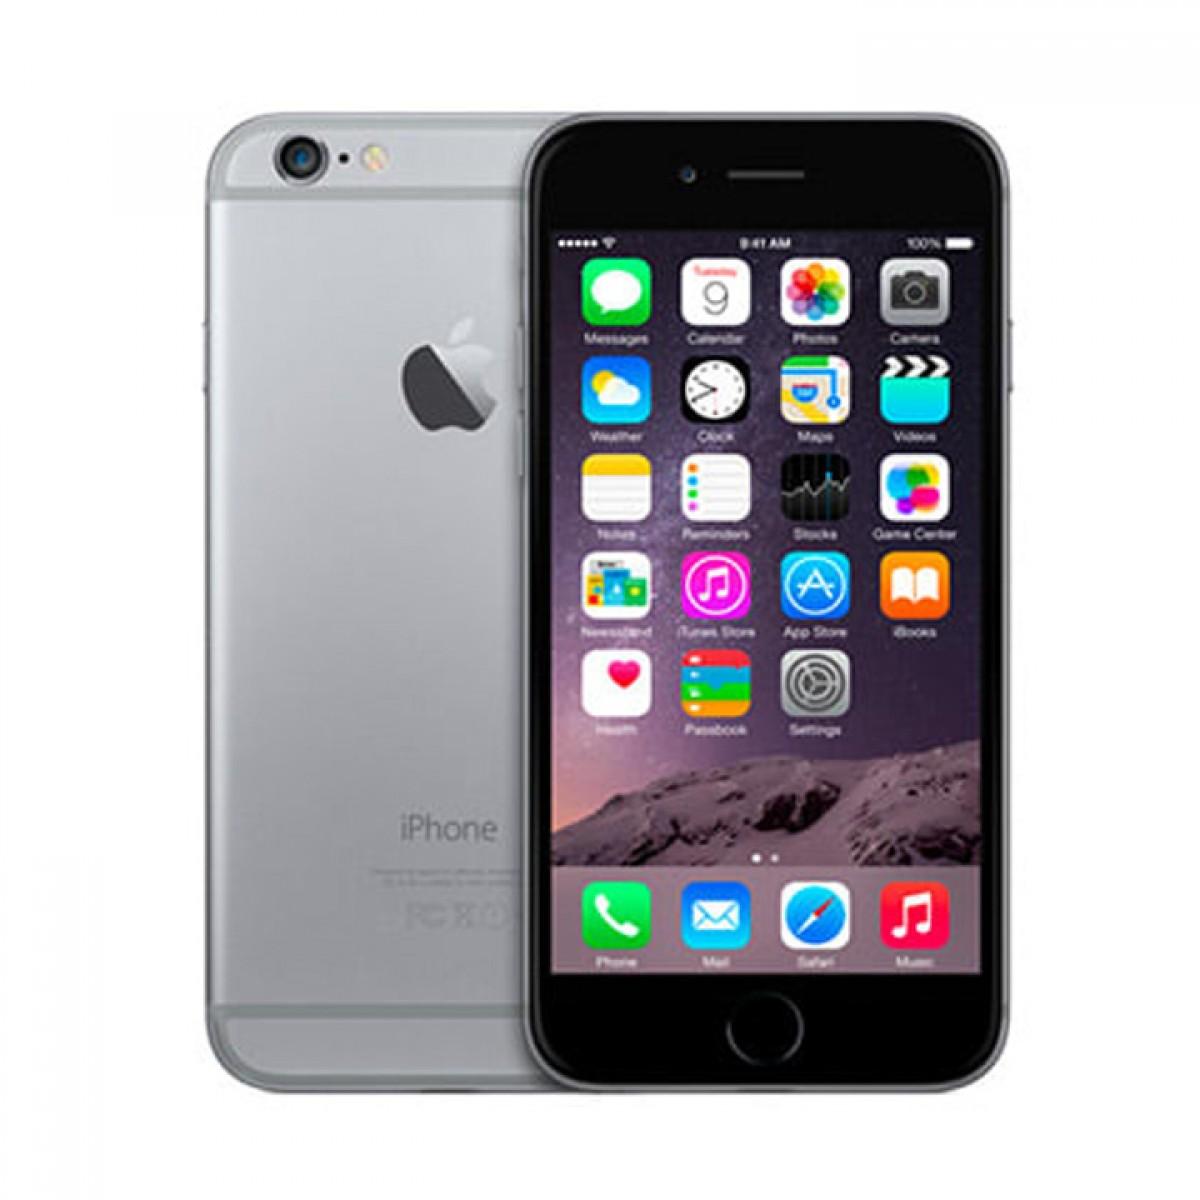 iPhone 6 64GB - Bản Lock - Used 99%